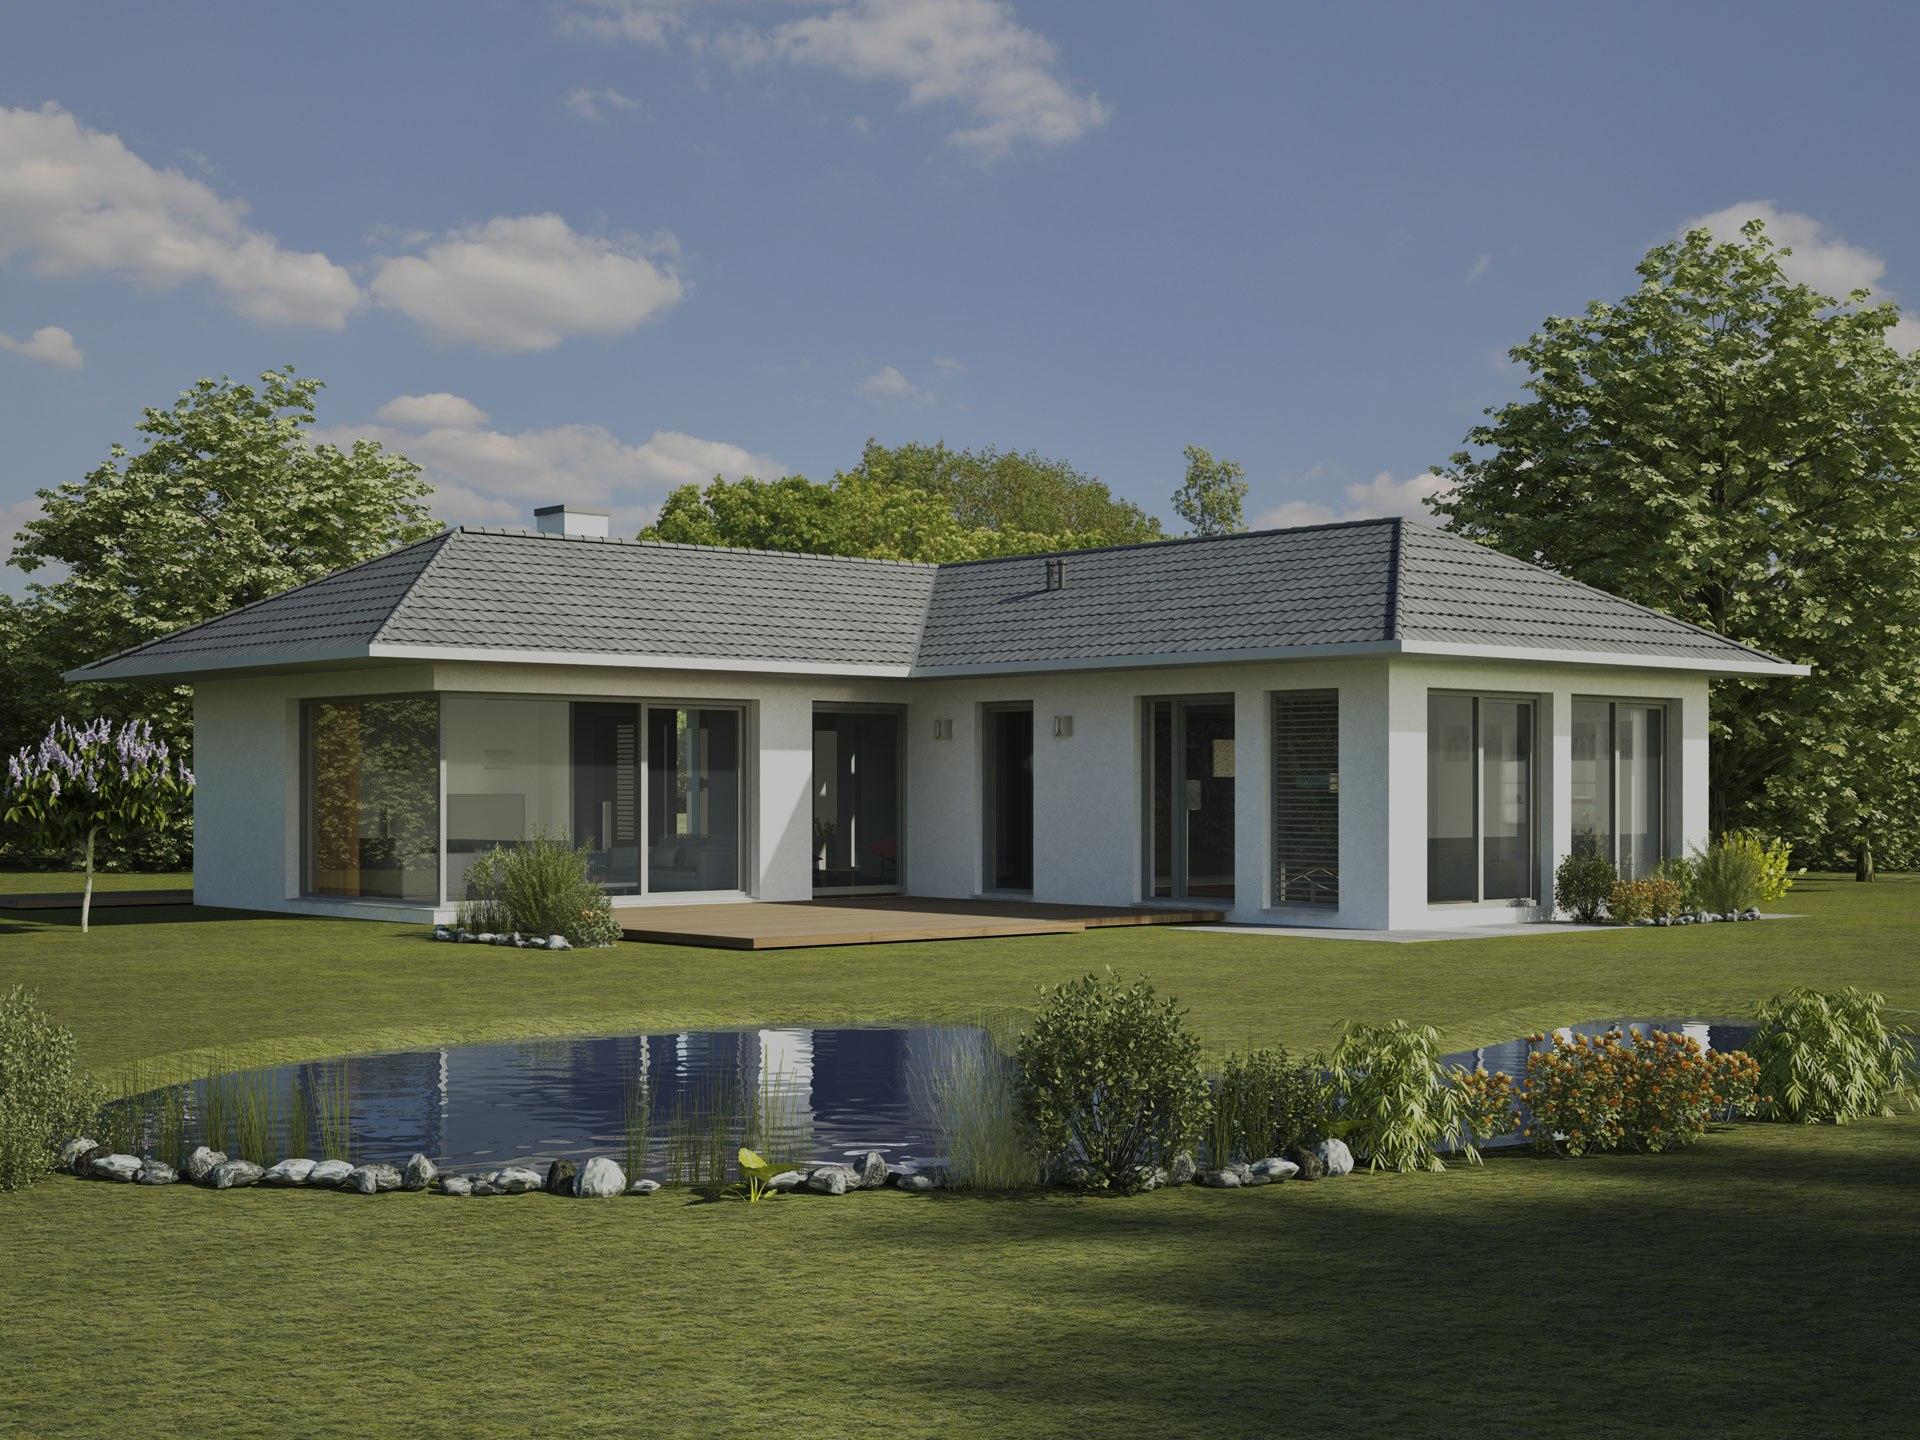 walmdach lieb fertighauslieb fertighaus. Black Bedroom Furniture Sets. Home Design Ideas